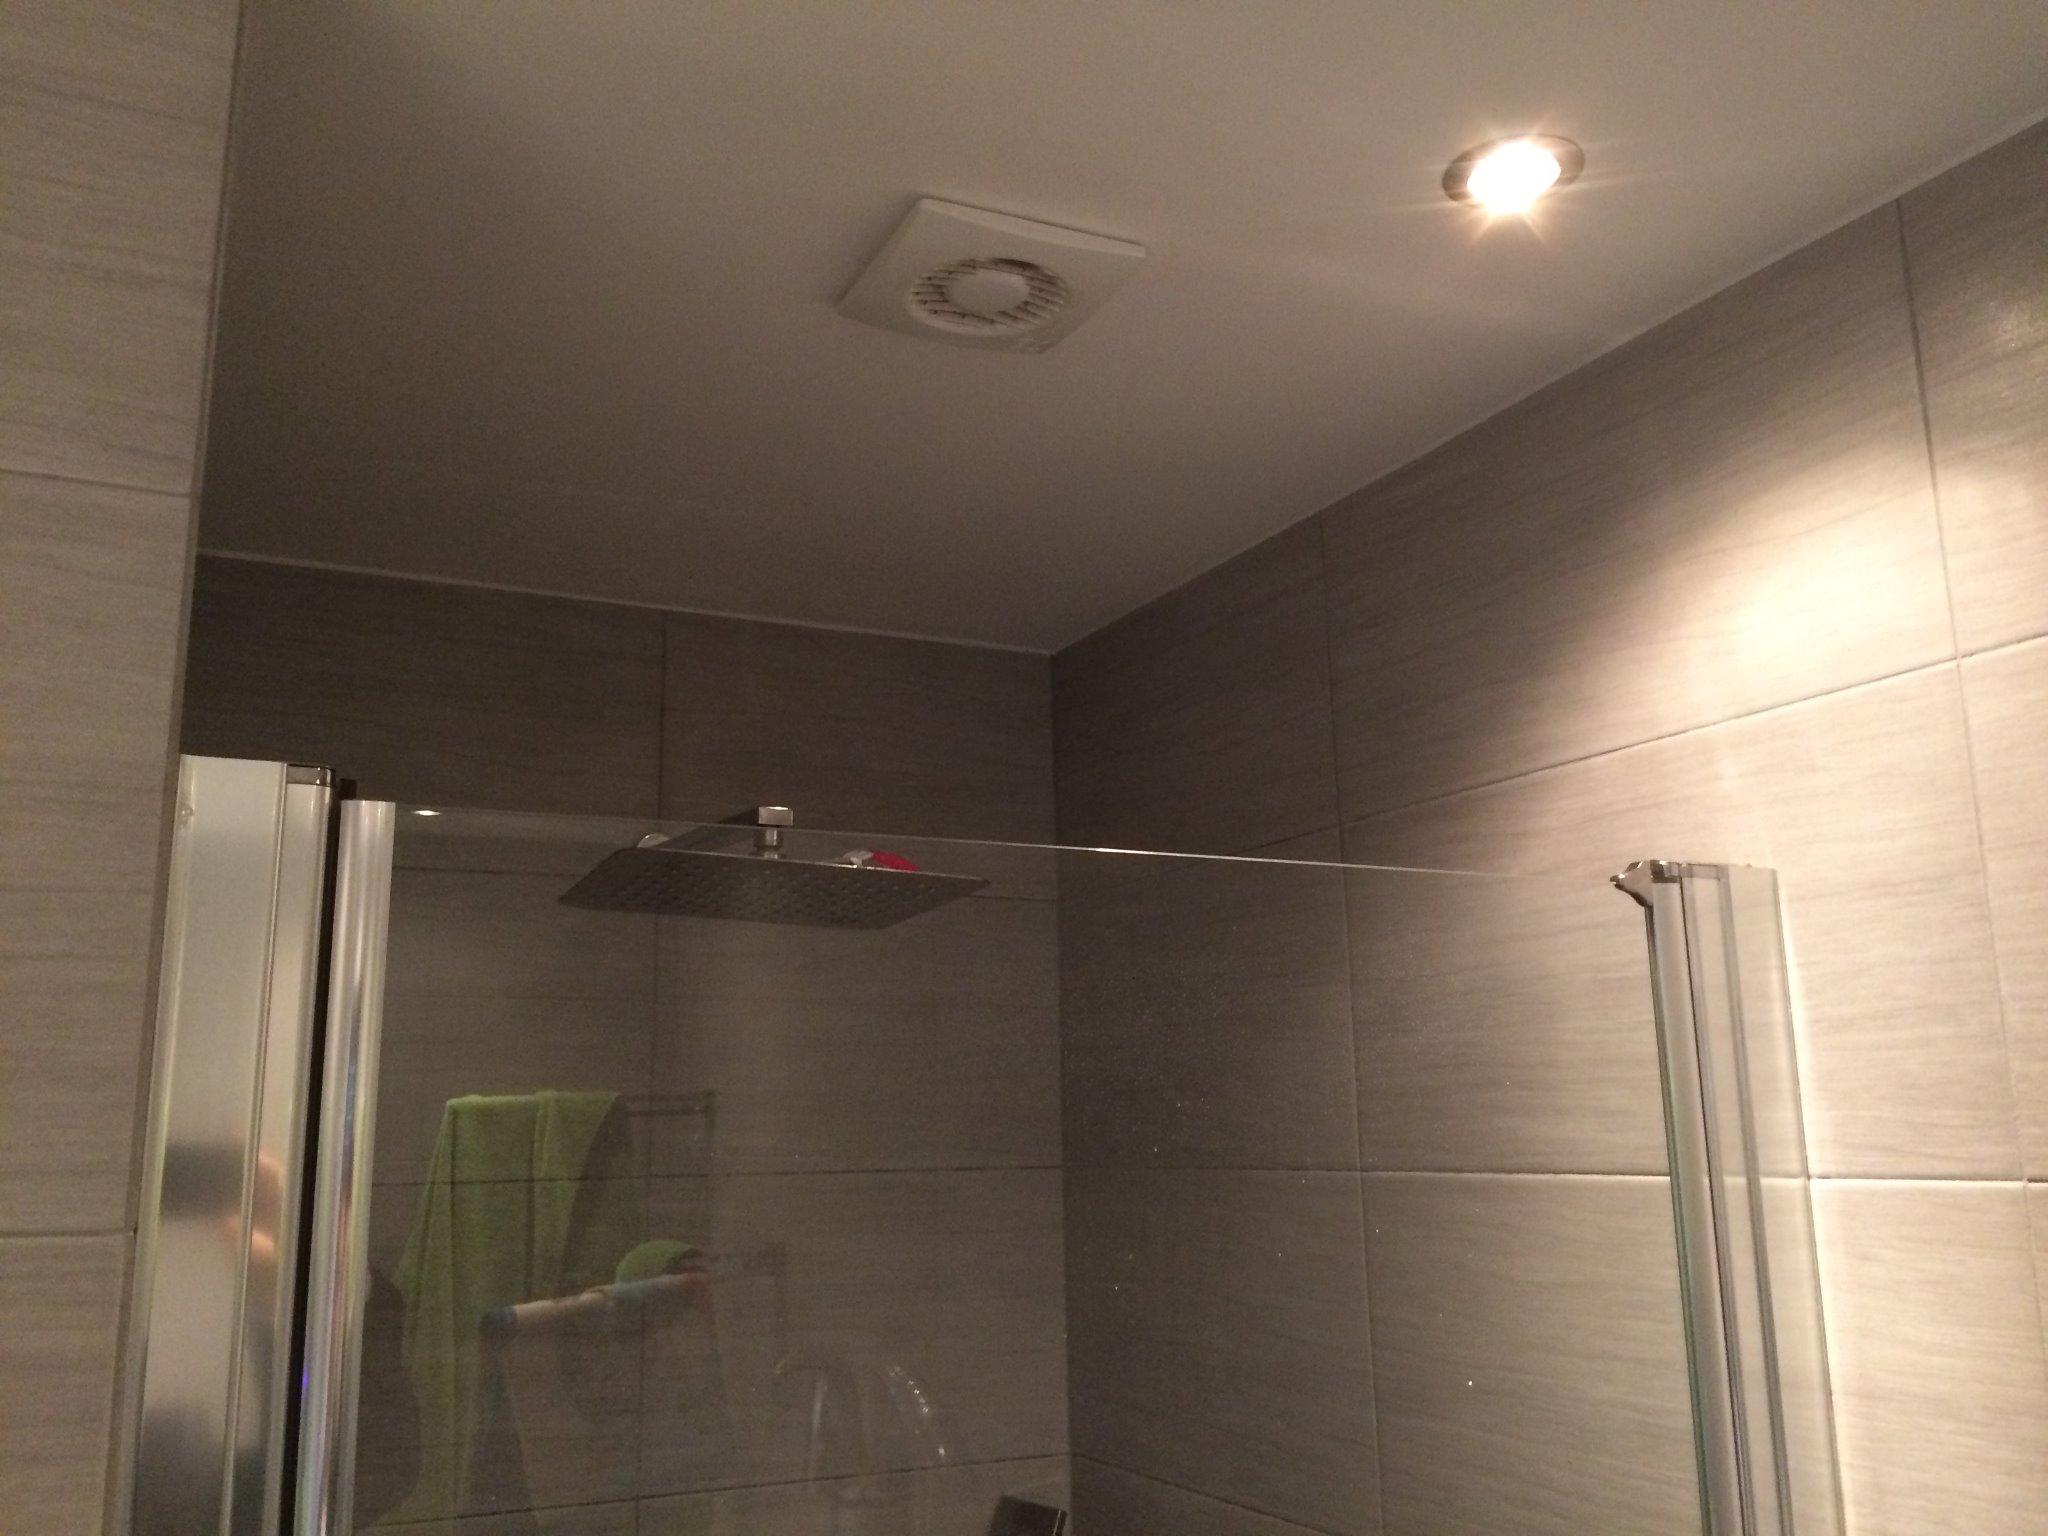 Afzuiging In Badkamer : Aanpassen afzuiging toilet en badkamer en kanaal maken afzuigkap